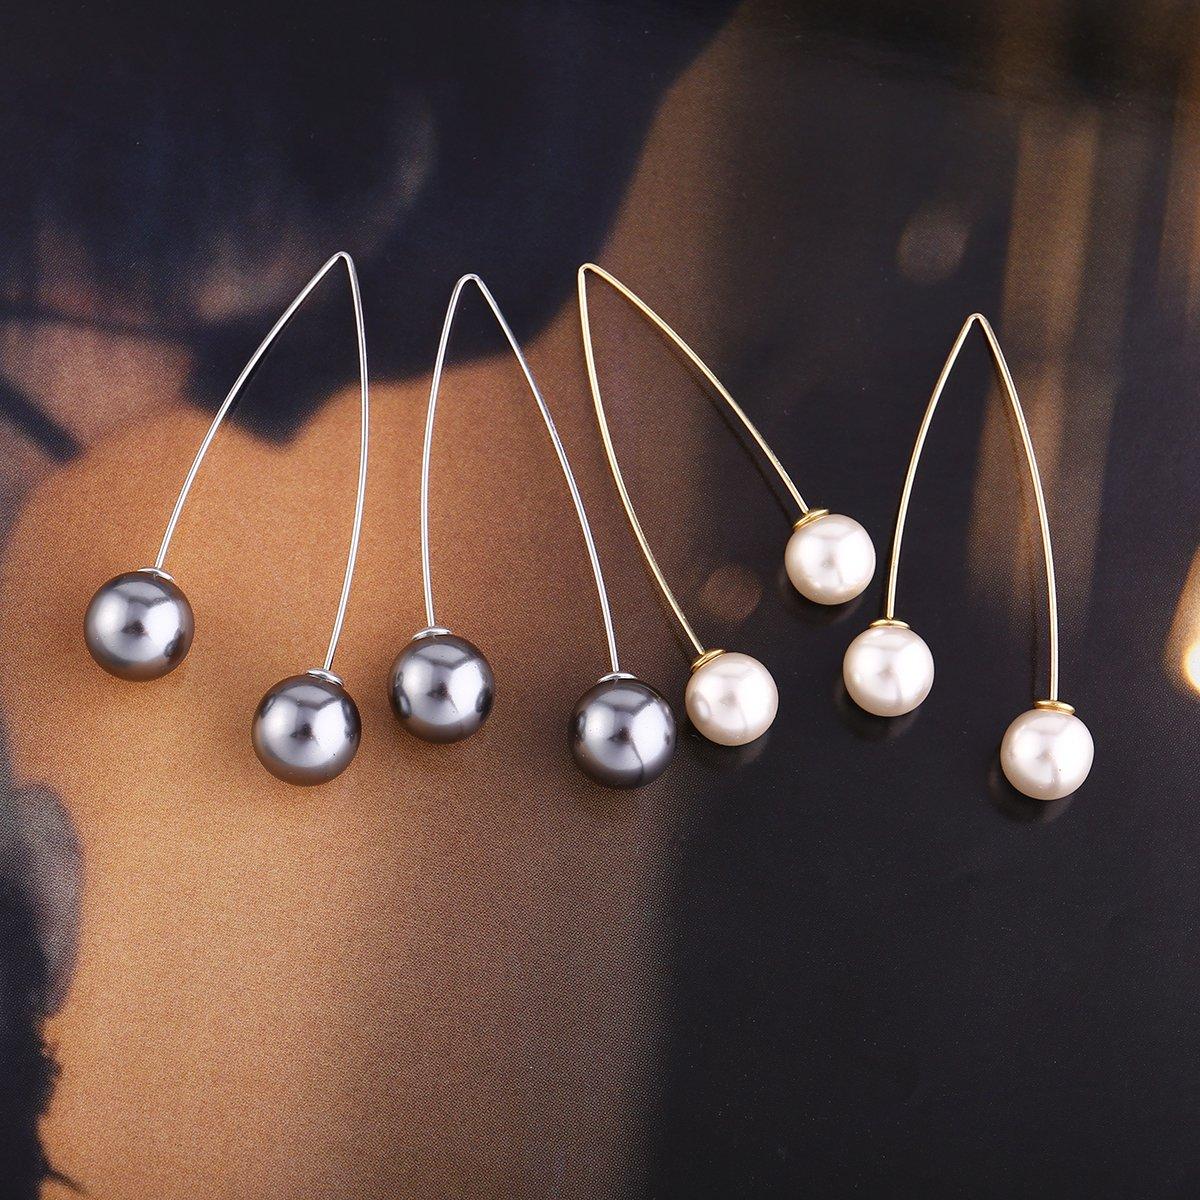 DVANIS Gold Plated Women Jewelry AAA Cubic Zirconia Girl Starfish Link Chain Bracelet Charm Adjustable